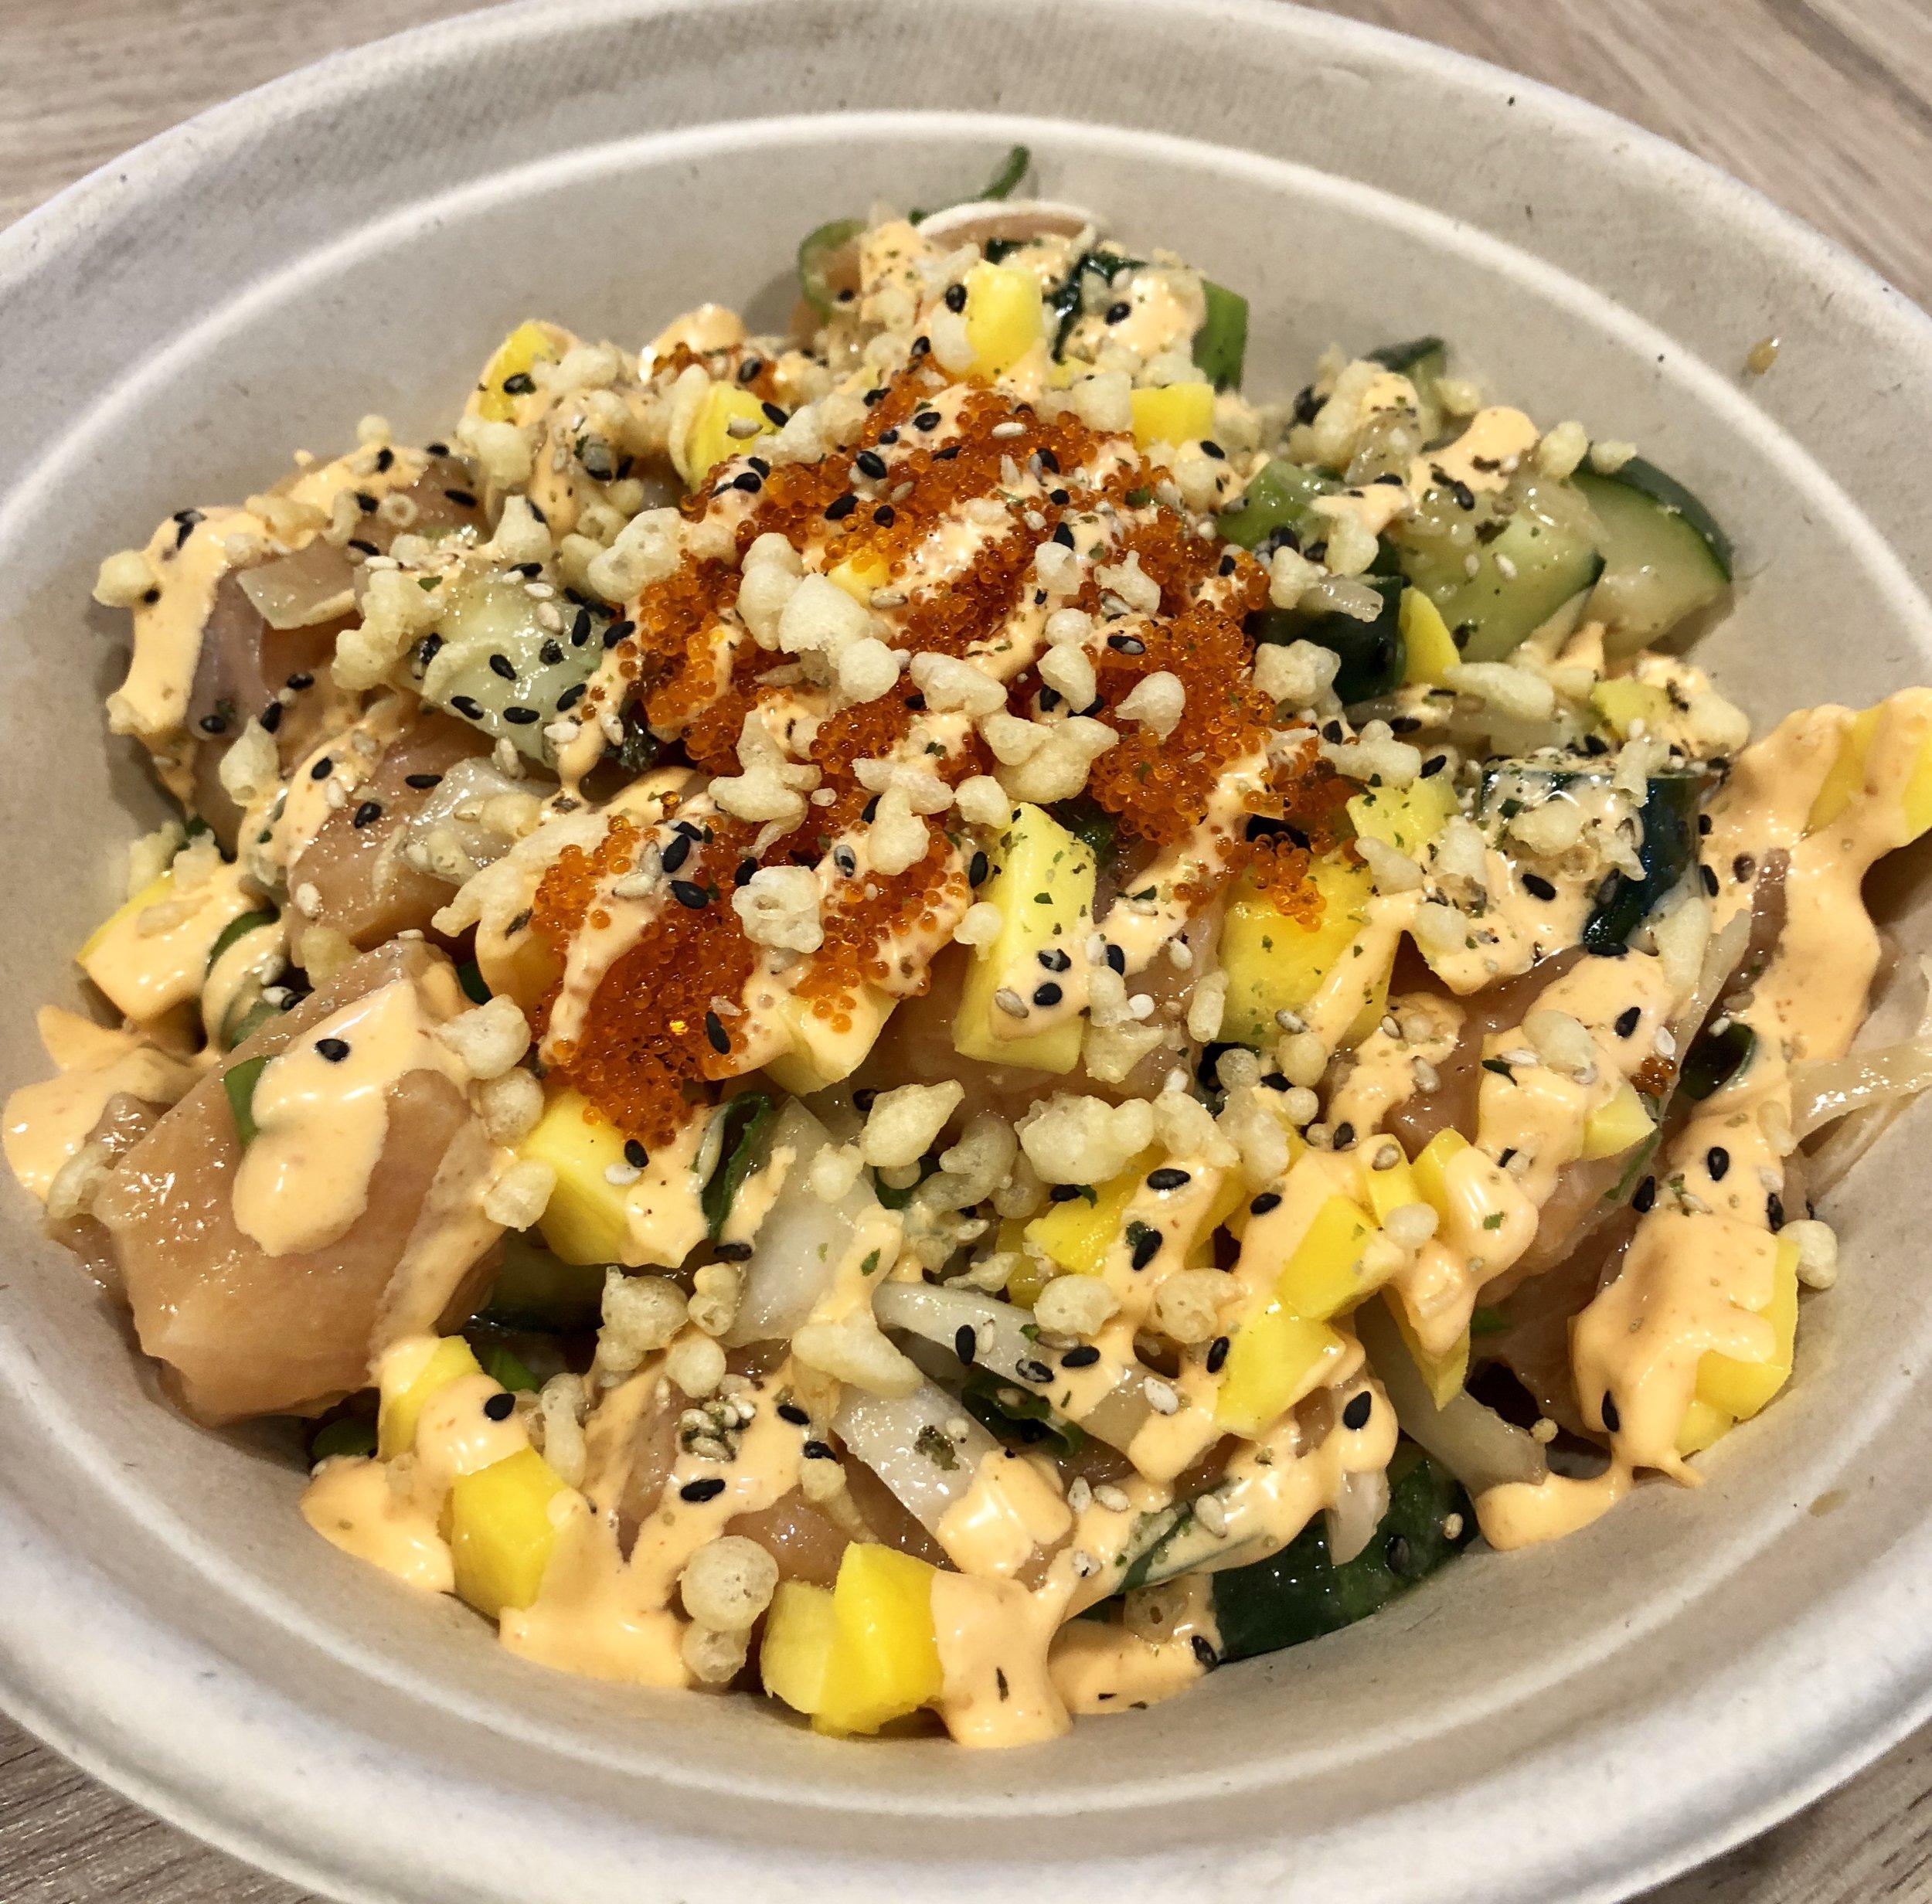 SRIRACHA MAYO   SALMON mixed with CUCUMBER, ONIONS, SCALLIONS, MANGO;  marinated in CITRUS, SPICY, GARLIC or GINGER PONZU;  topped with TOBIKO, FURIKAKE, TEMPURA CRISPS;  with SRIRACHA MAYO drizzle.